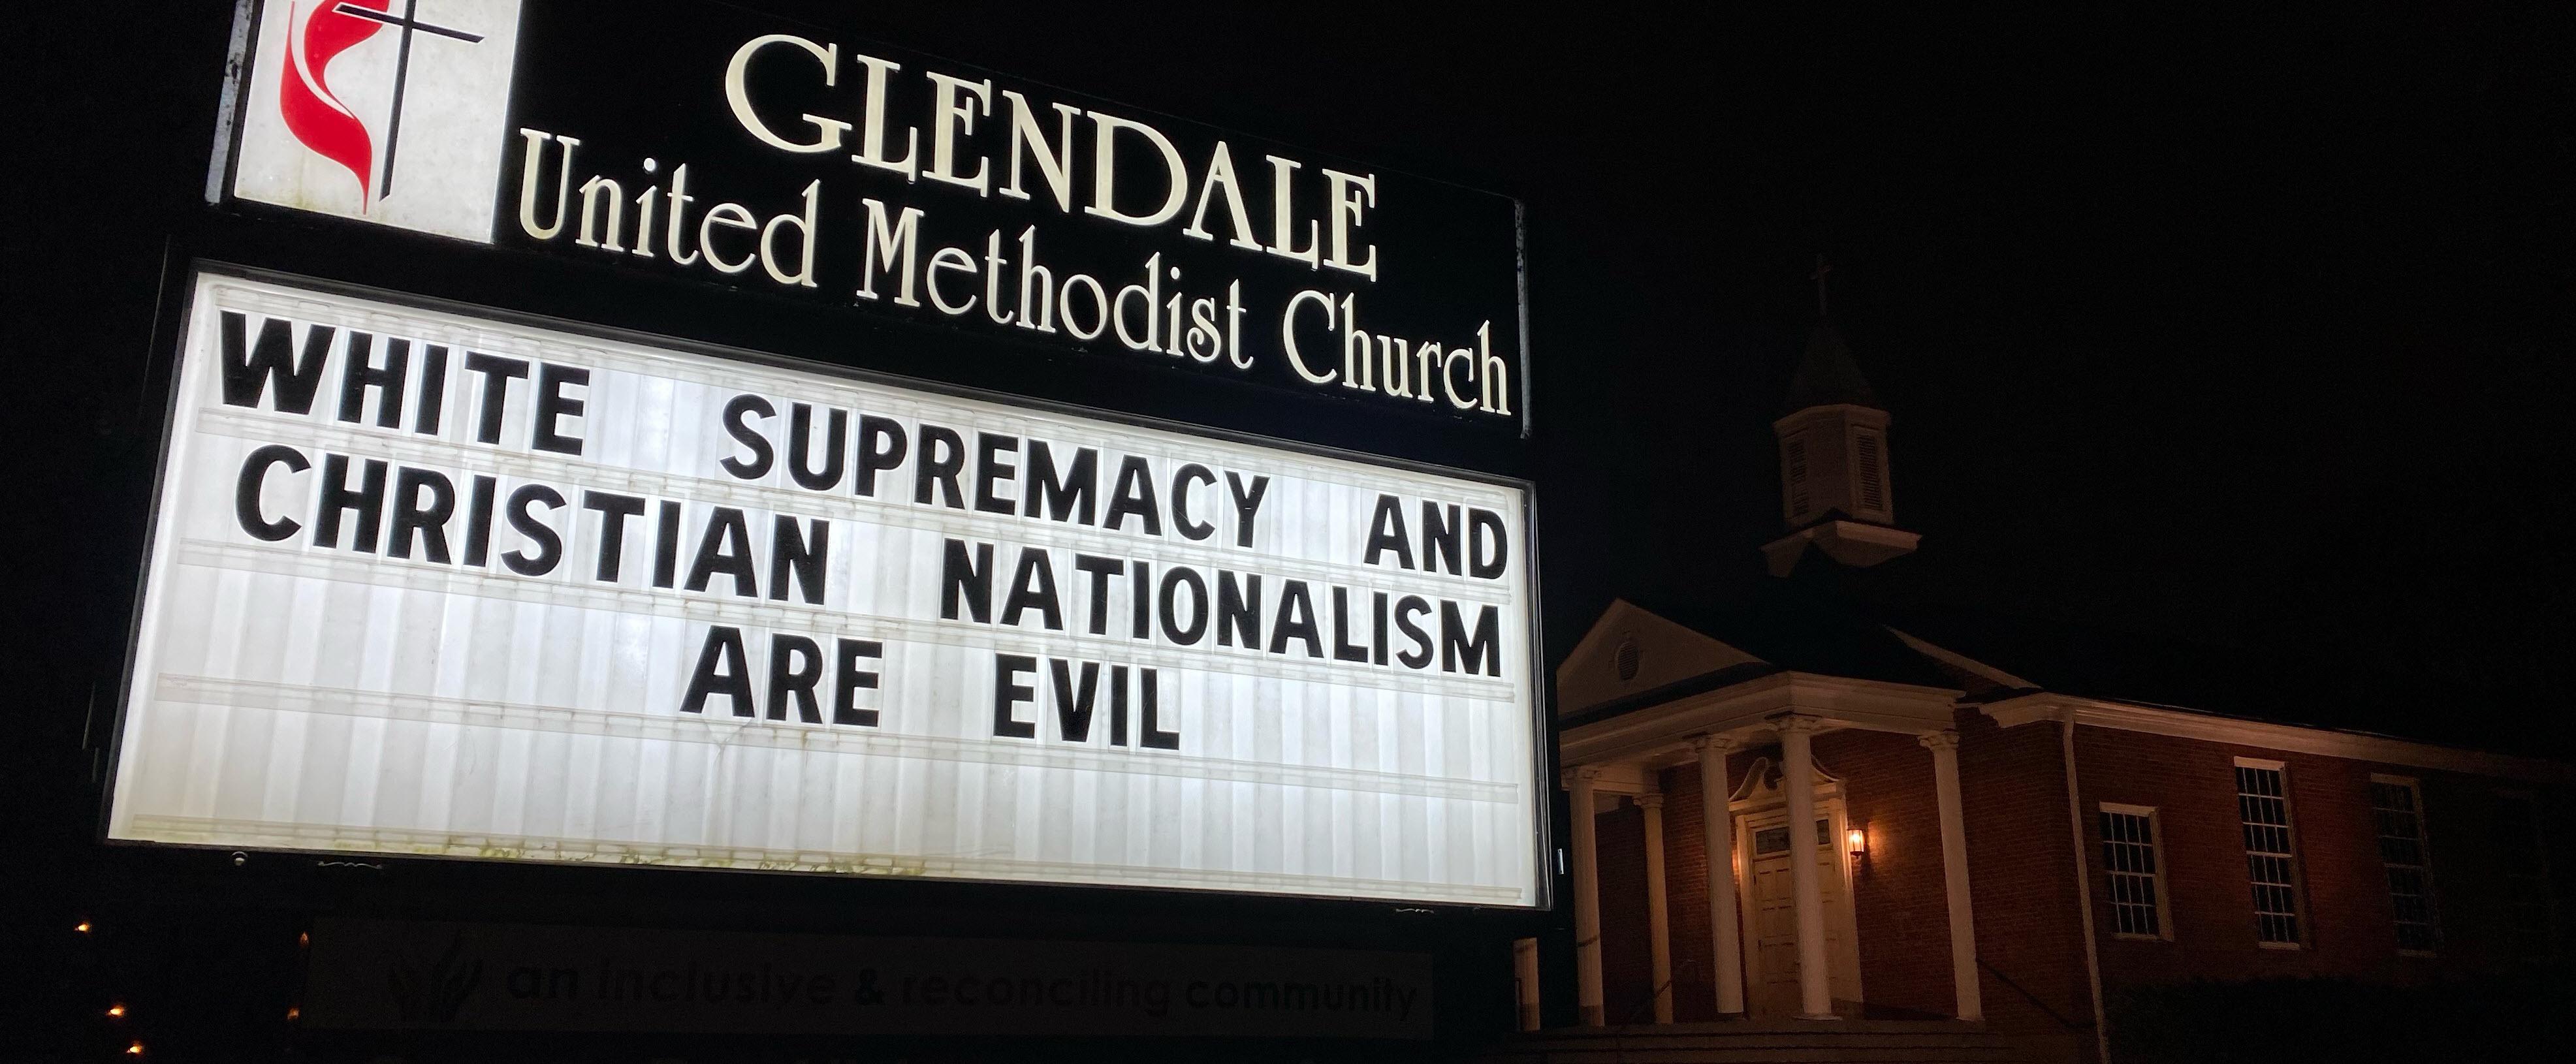 Anti-racism sign outside Glendale United Methodist Church